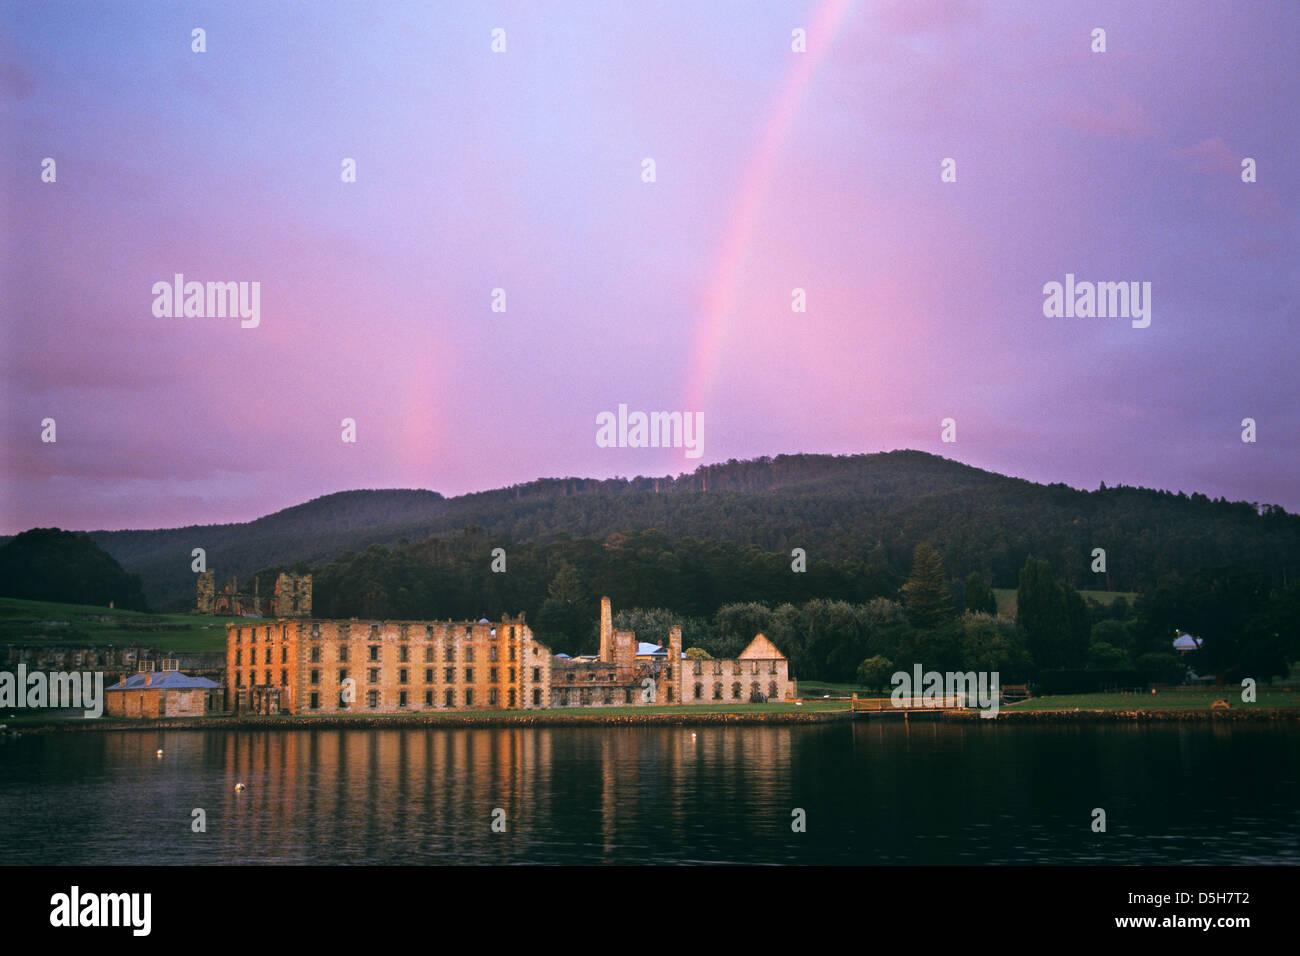 Australia, Tasmania, Tasman Peninsula, Port Arthur Historic Convict Site, rainbow over the concict Penitentiary - Stock Image